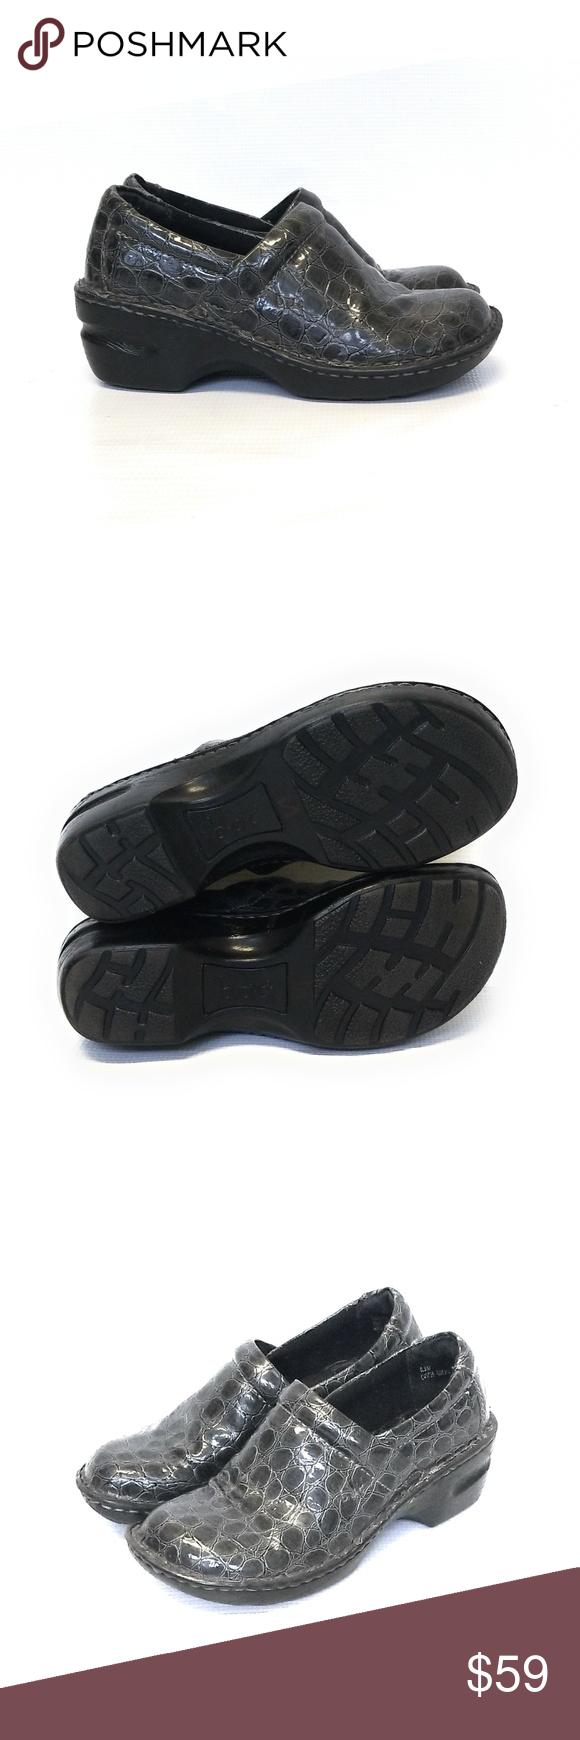 bbea990f08 b.o.c. Gray Croc Leather Nurses Nursing Shoes 6.5 b.o.c. Born Womens  Charcoal Gray Croc Nurses Shoes Clogs Size 6.5 Perfect condition Size 6 1/2  If you have ...